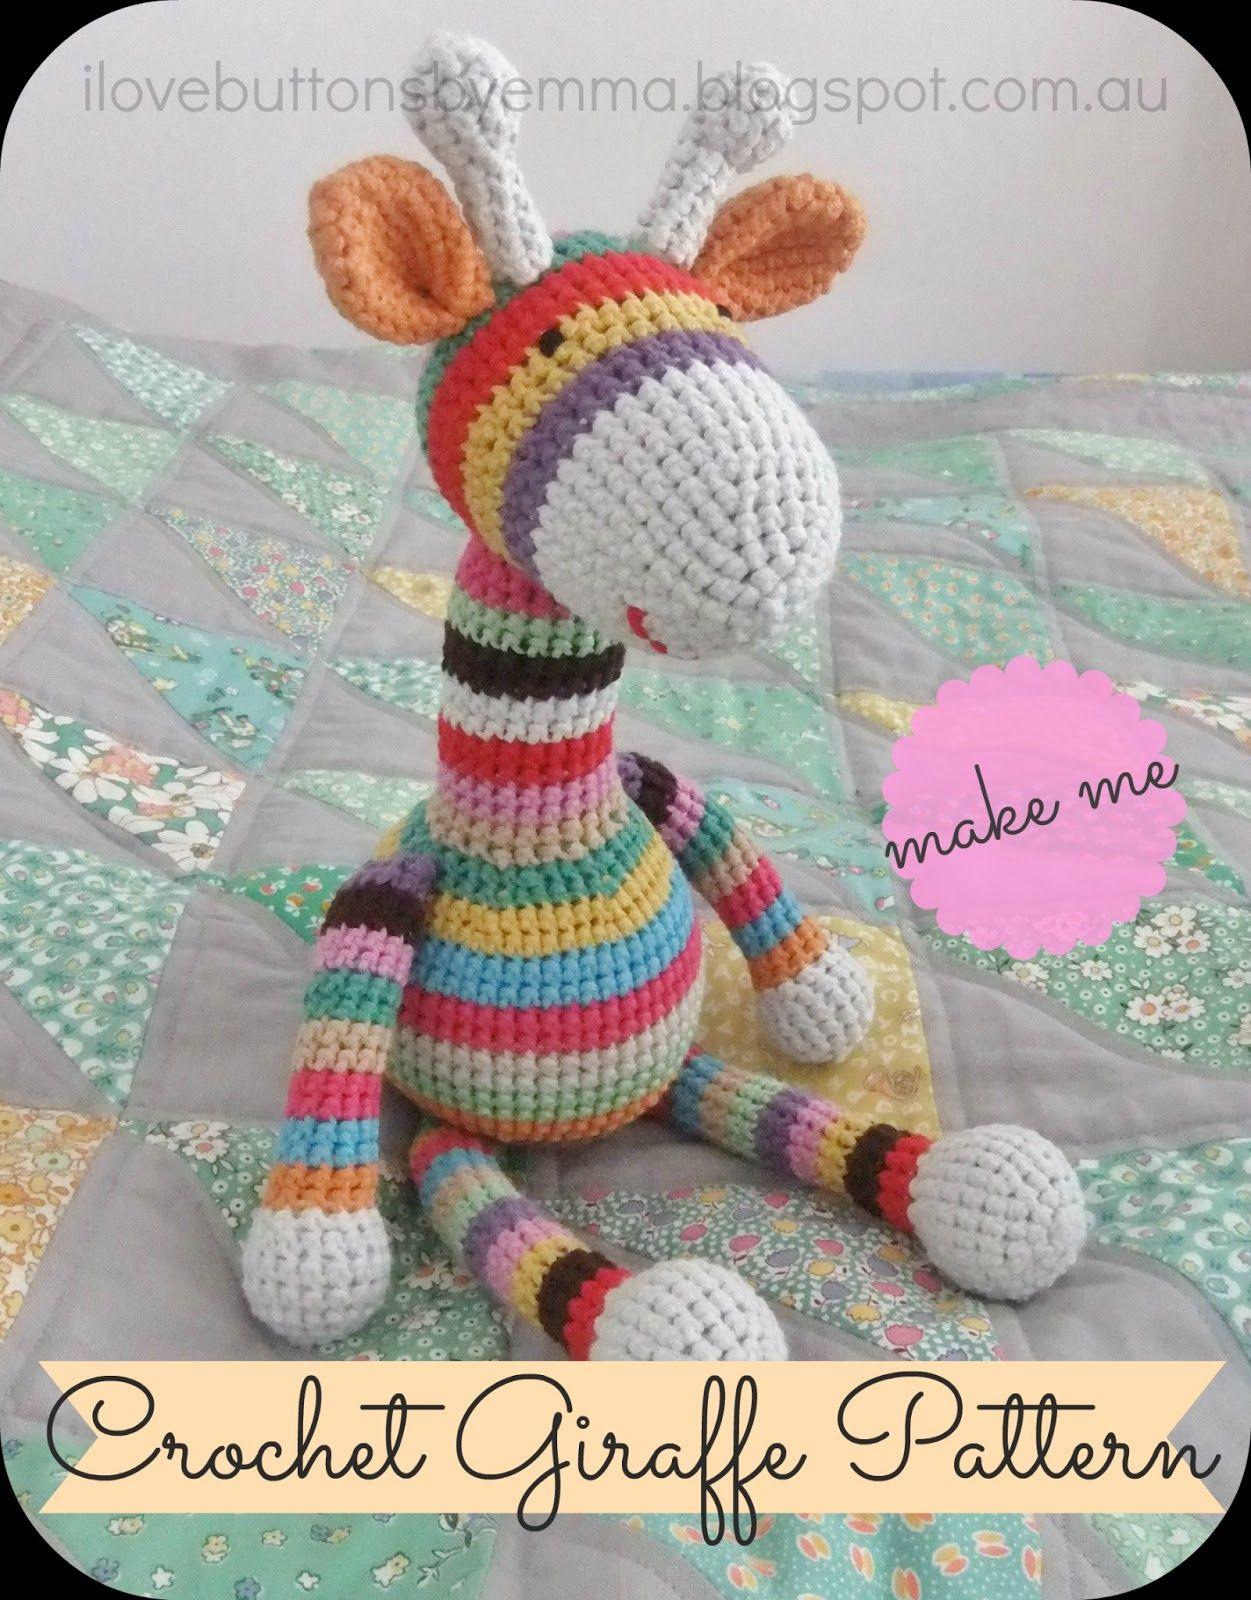 Crochet giraffe pinteres 20 free amigurumi patterns to melt your heart bankloansurffo Gallery